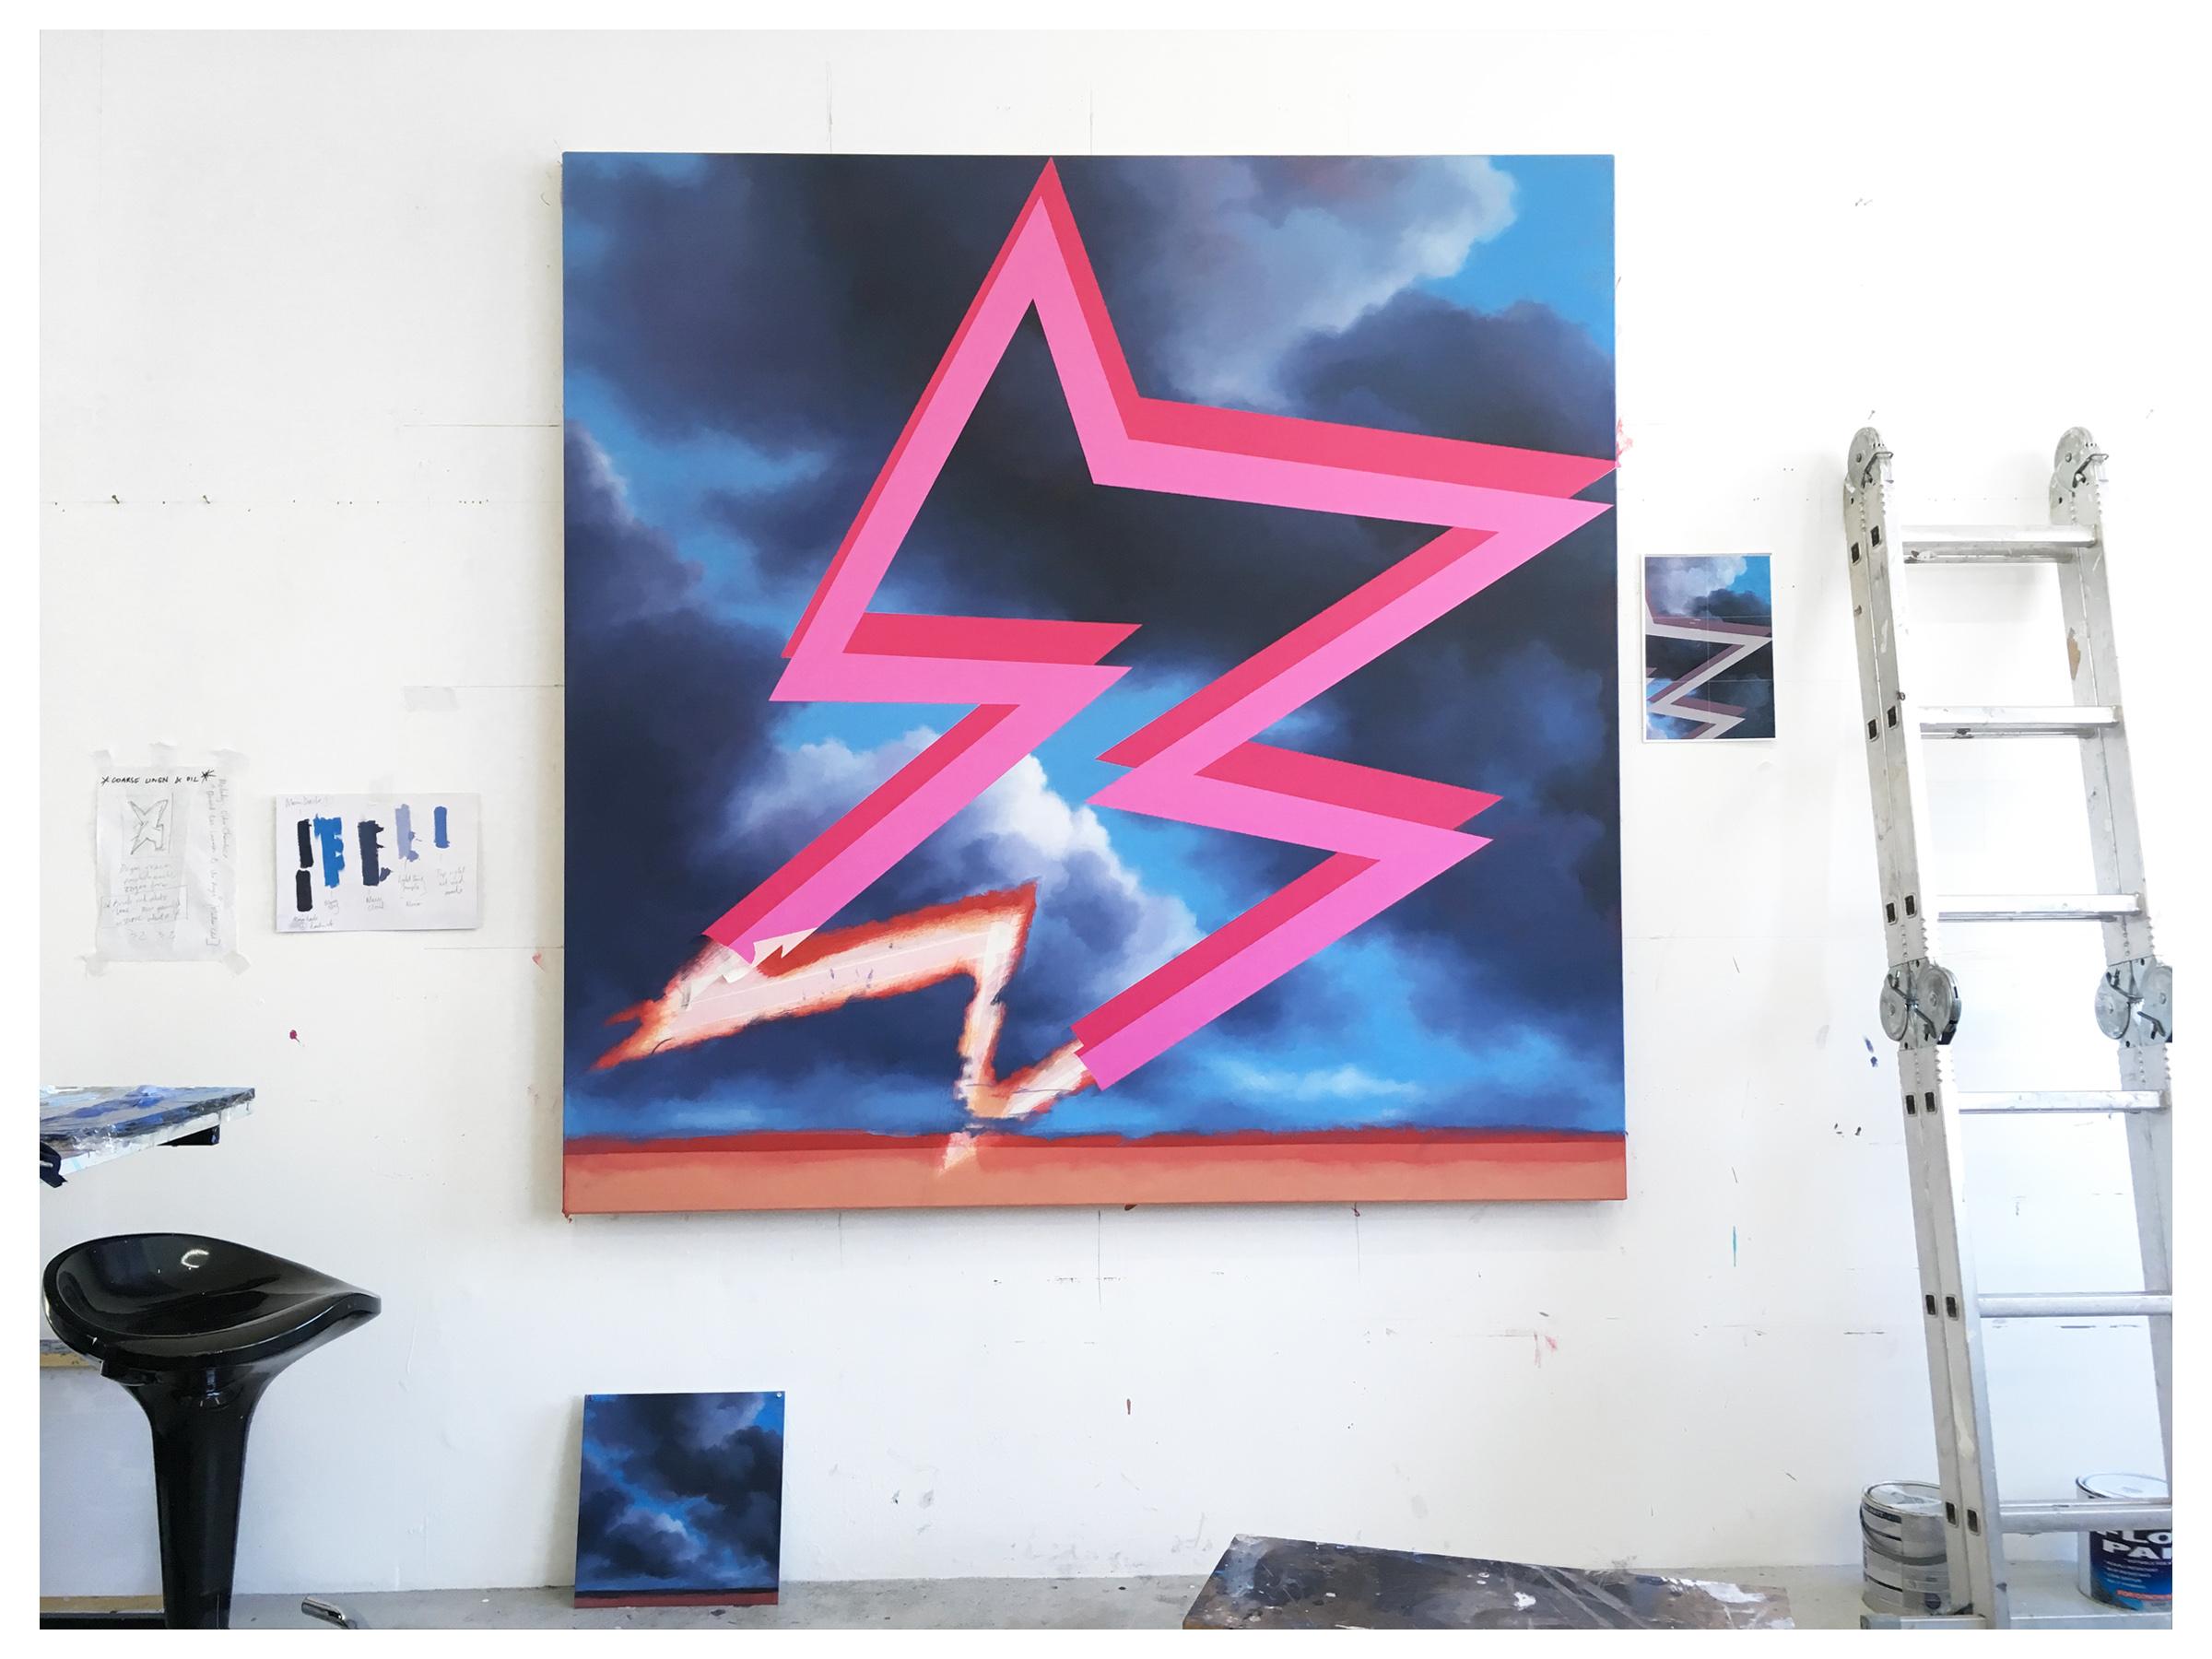 mike_edwards_art_studio_magna_carta_painting.jpg